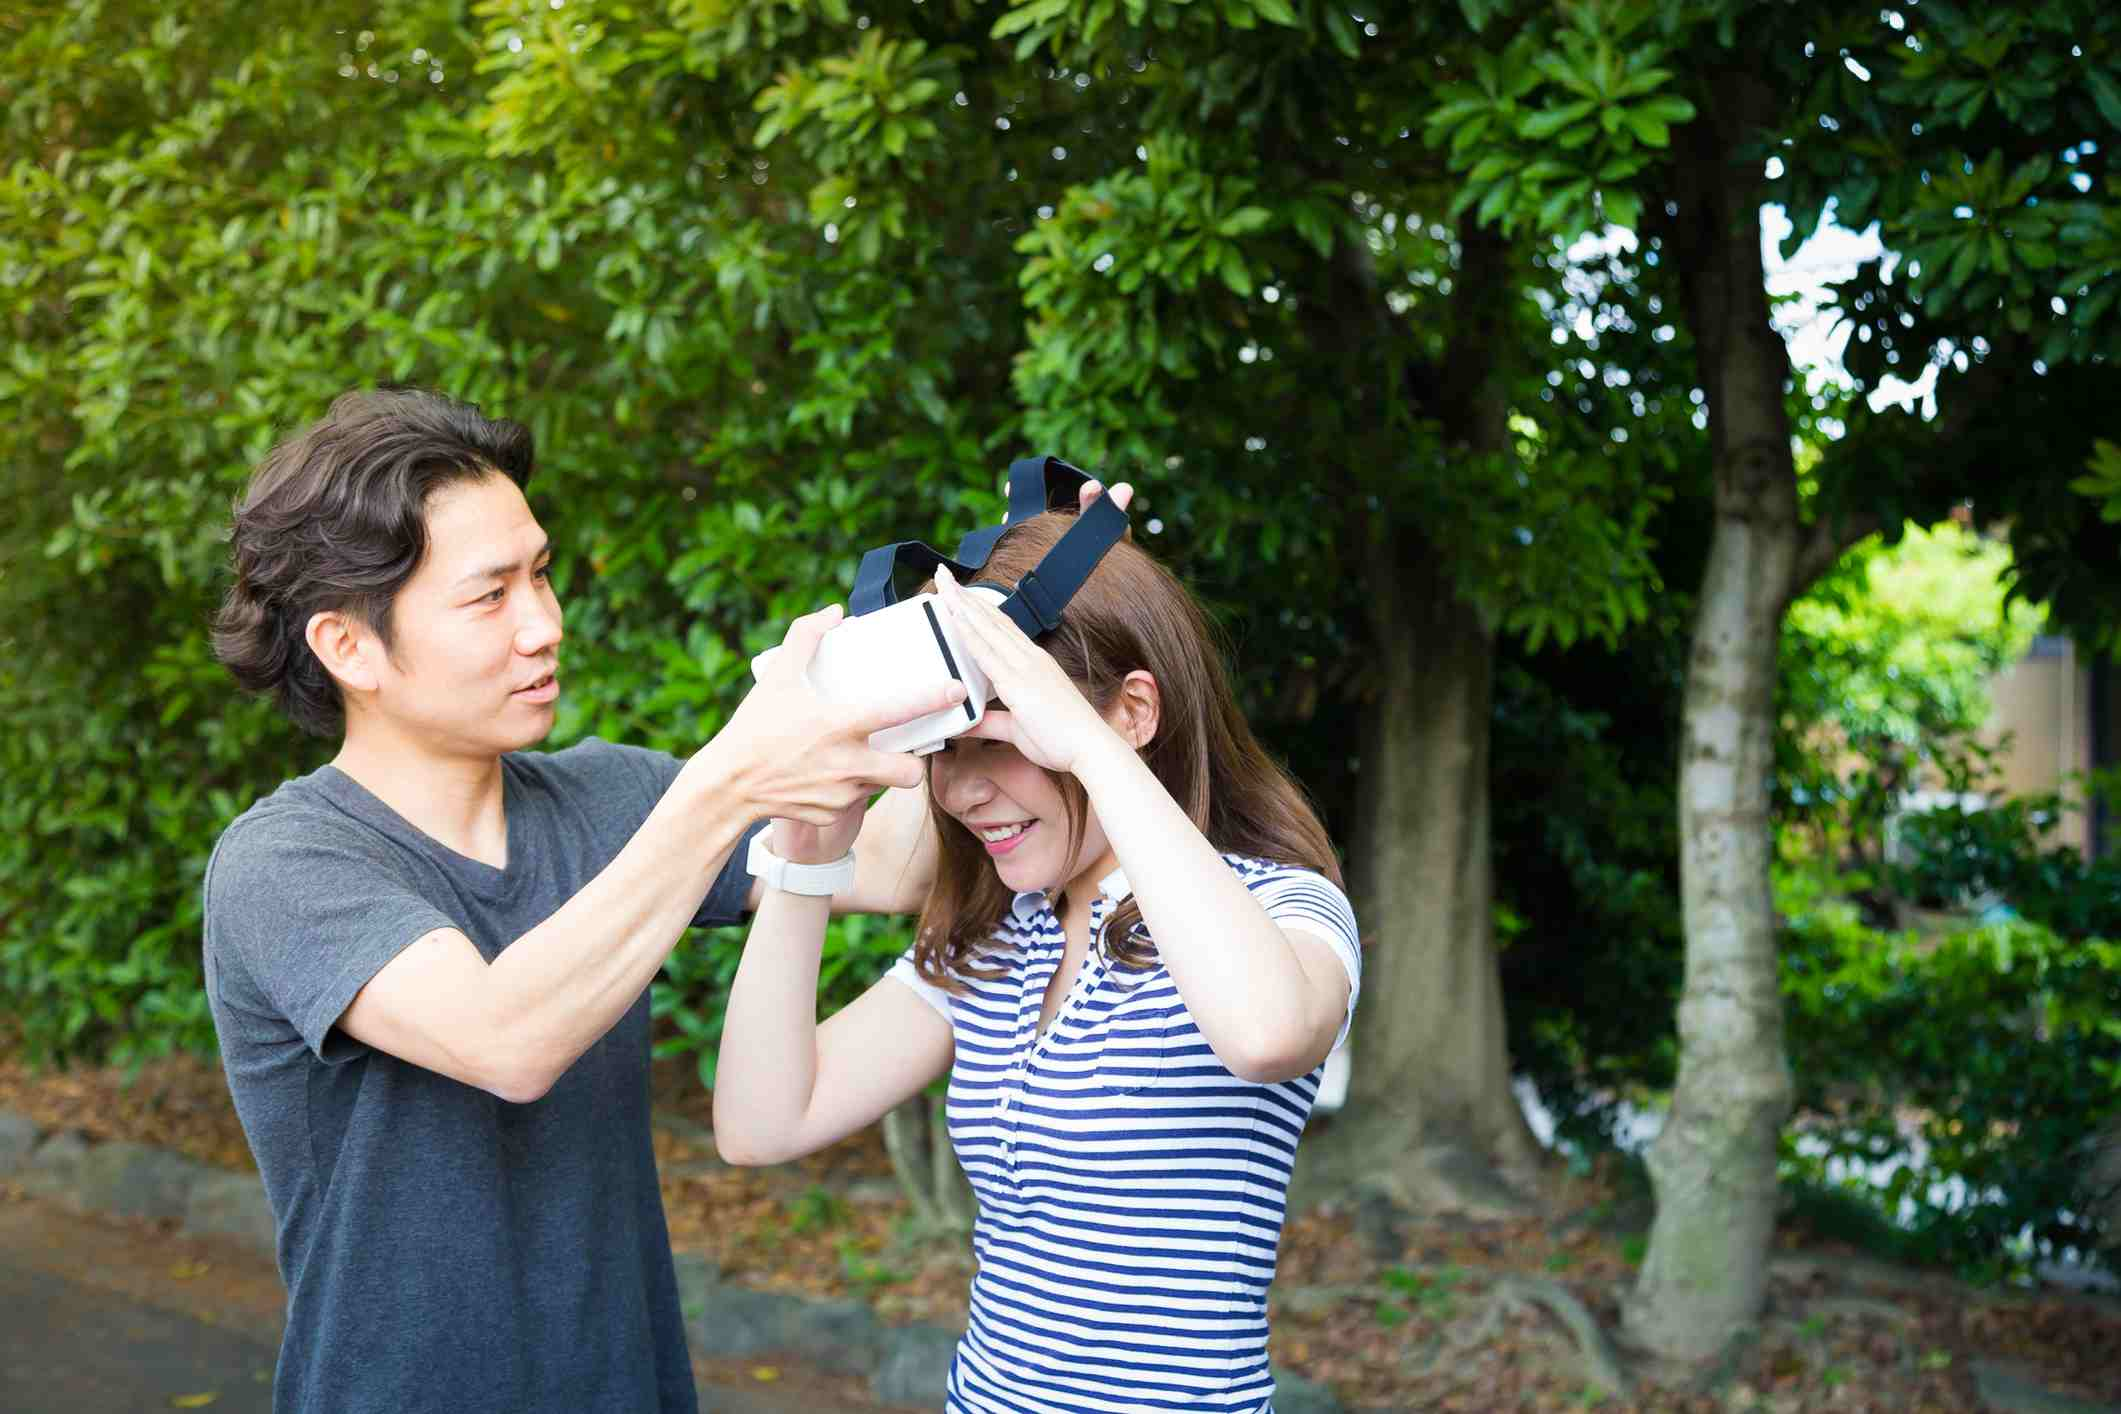 Man taking VR set off of girl's head